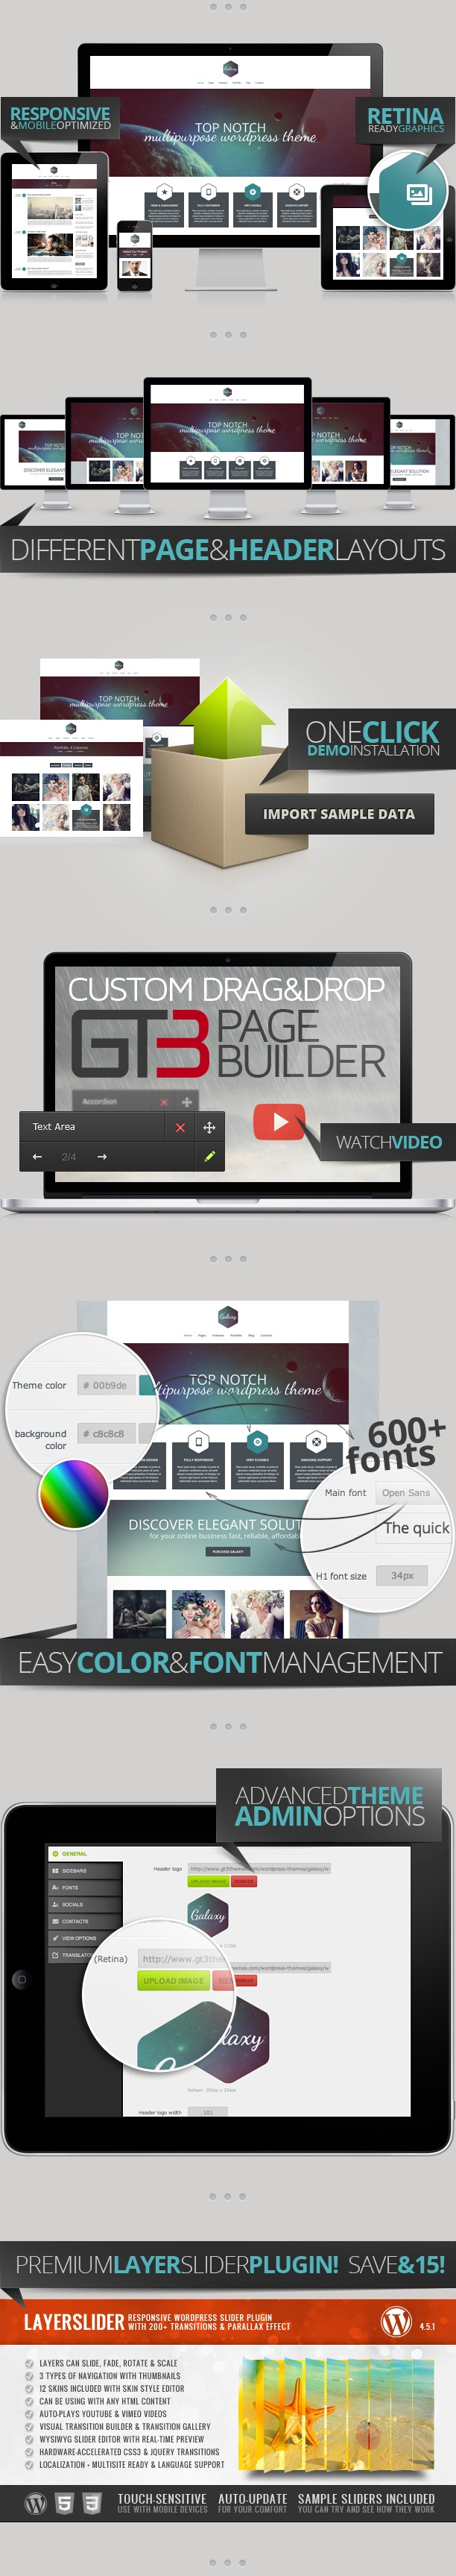 Galaxy Responsive Portfolio Wordpress Theme (Portfolio) - PROFIREFOX